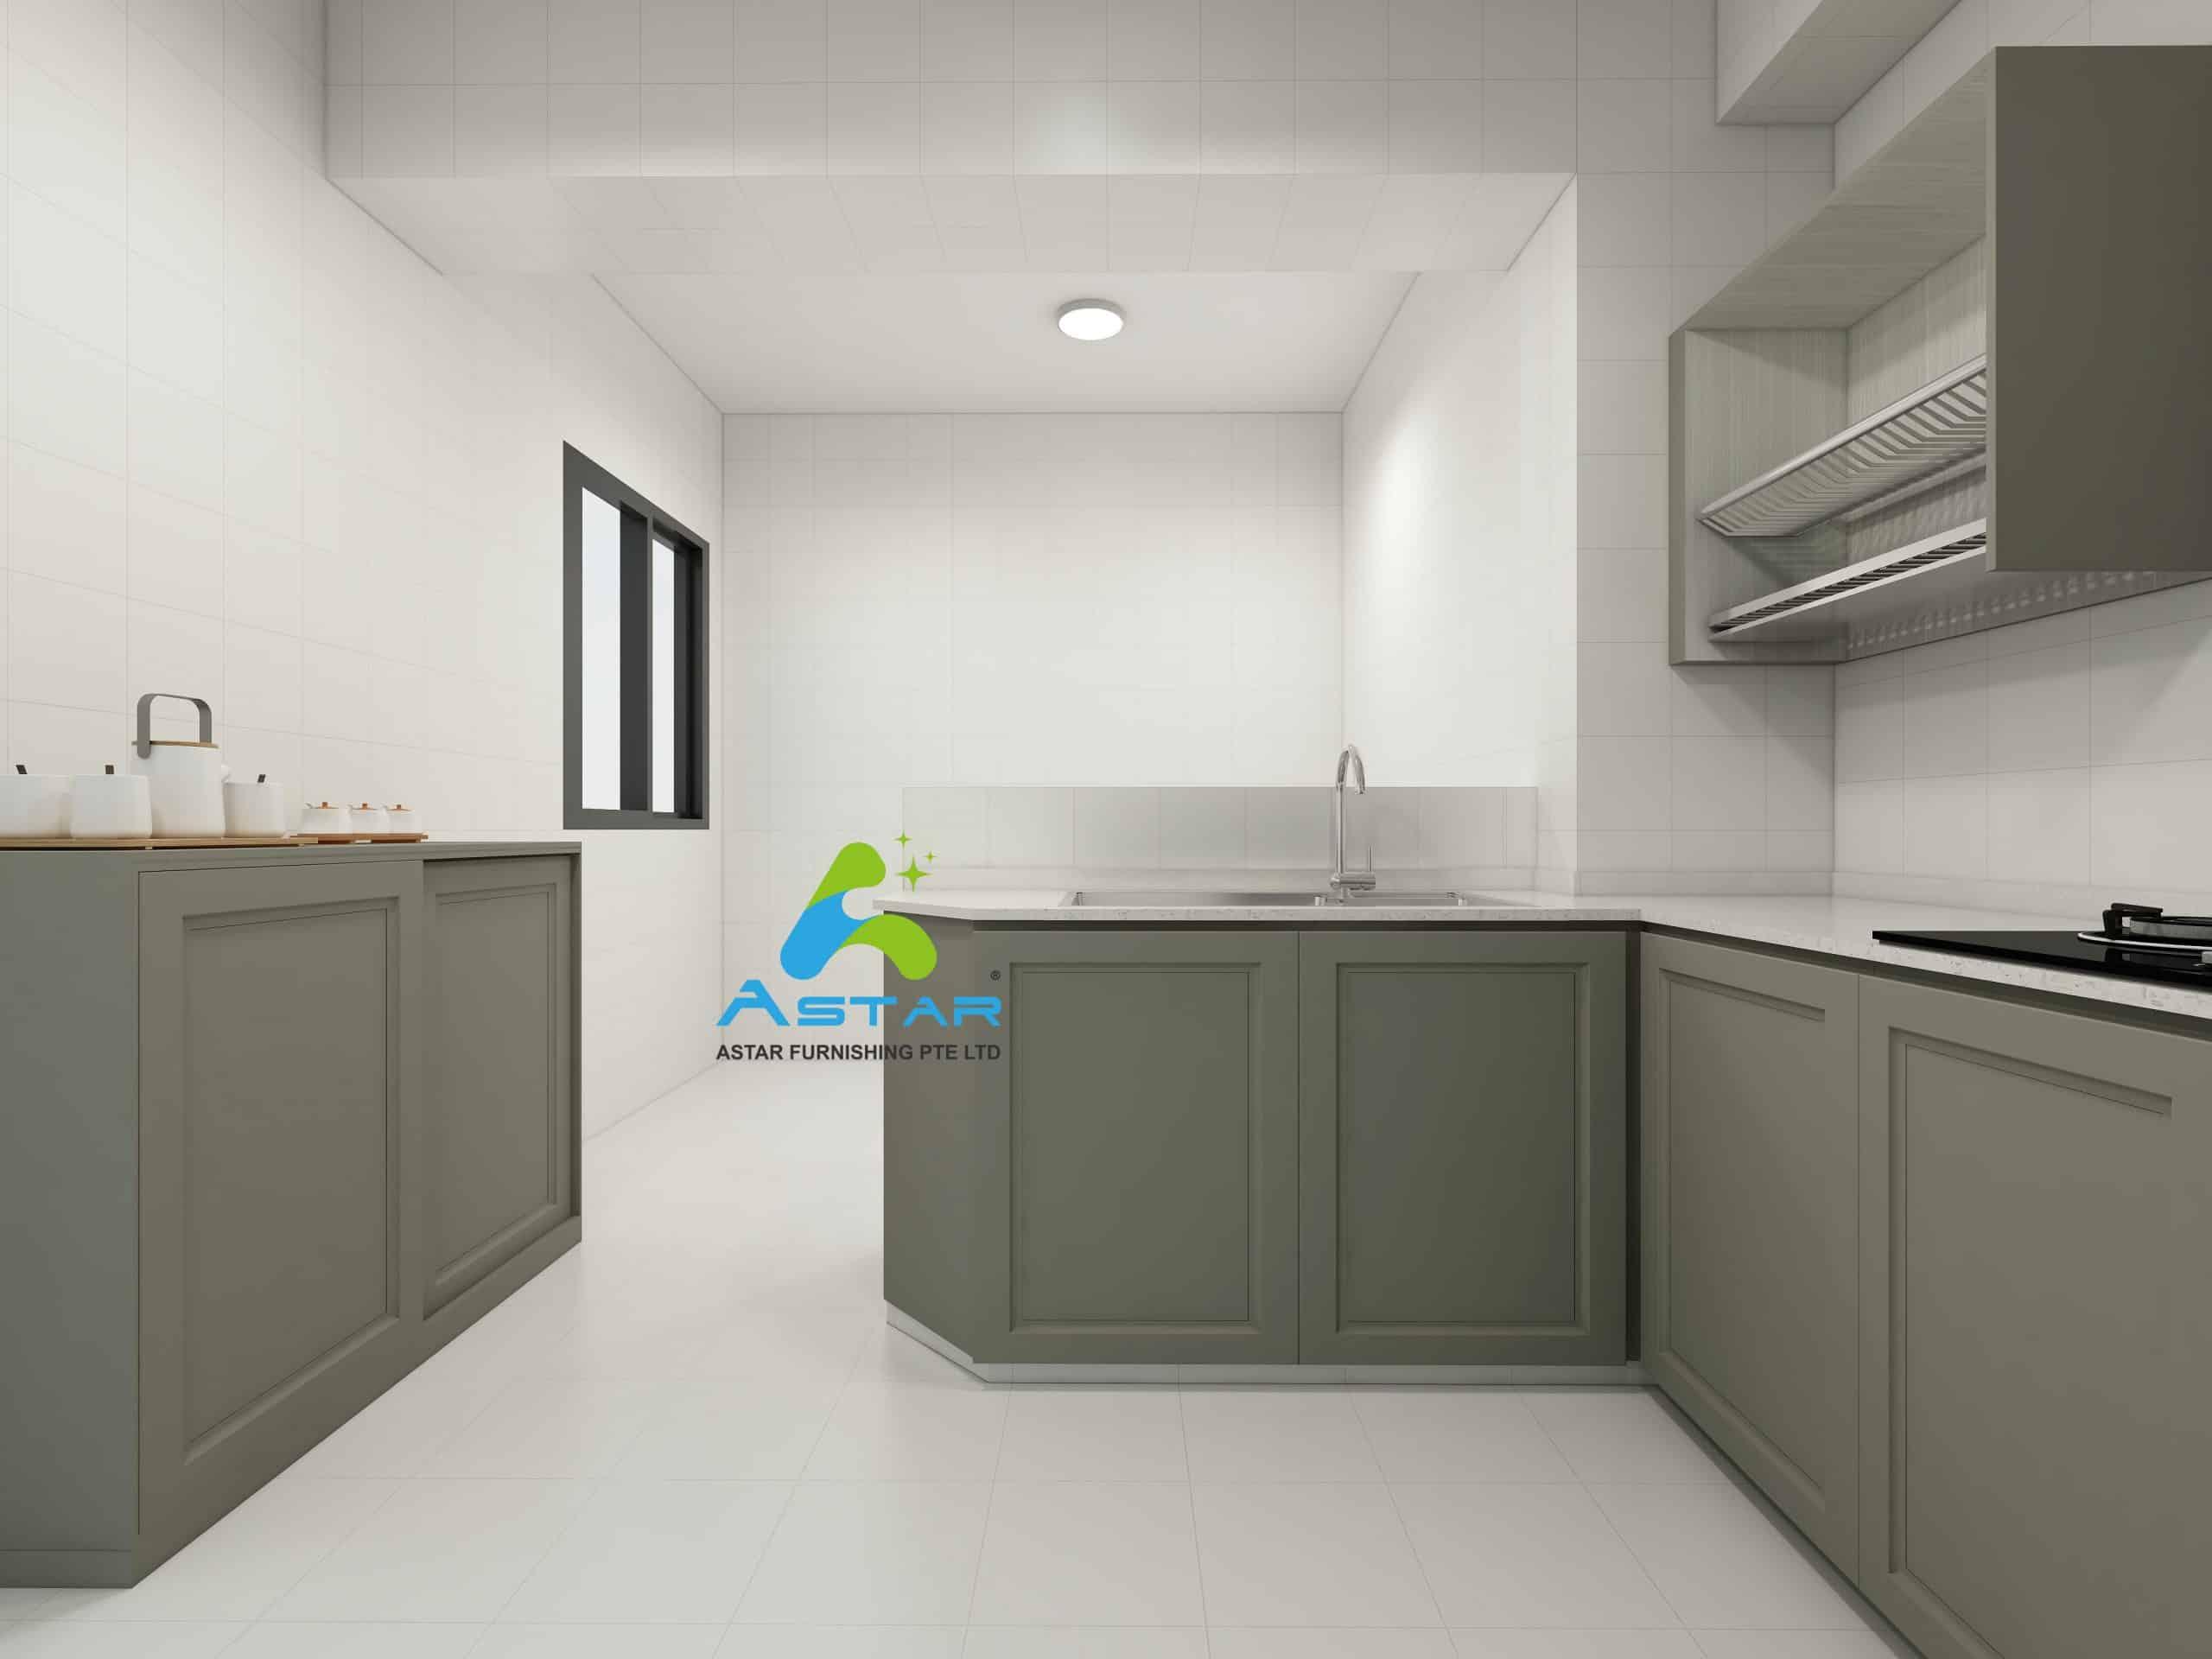 a star furnishing aluminium projects 17. Blk 679 Choa Chu Kang Crescent 039 scaled